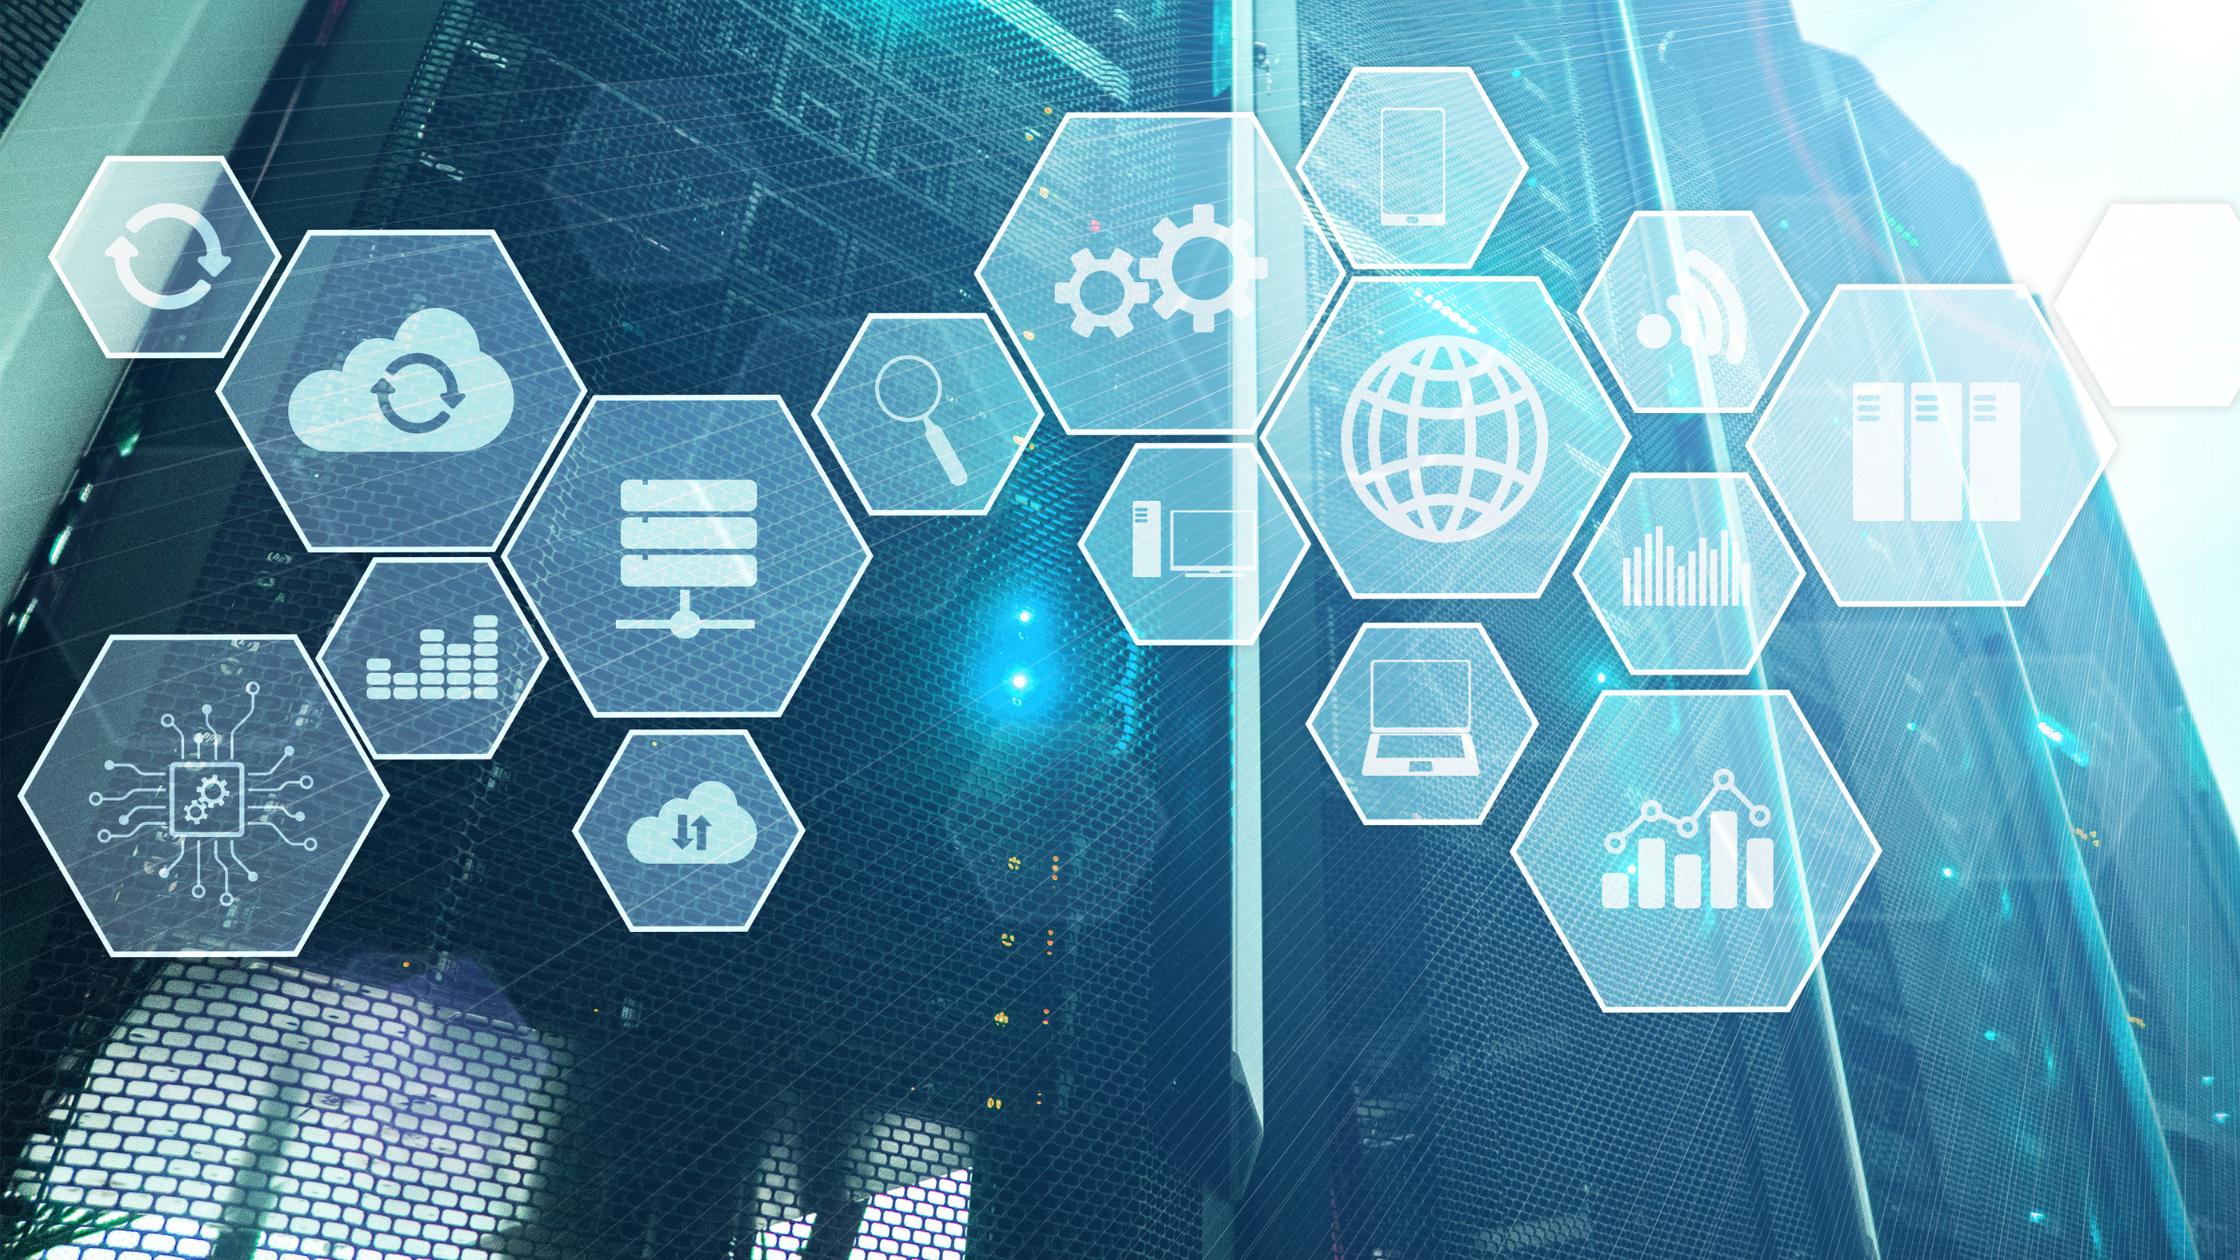 Bundled Benefits of a Total Technology Provider